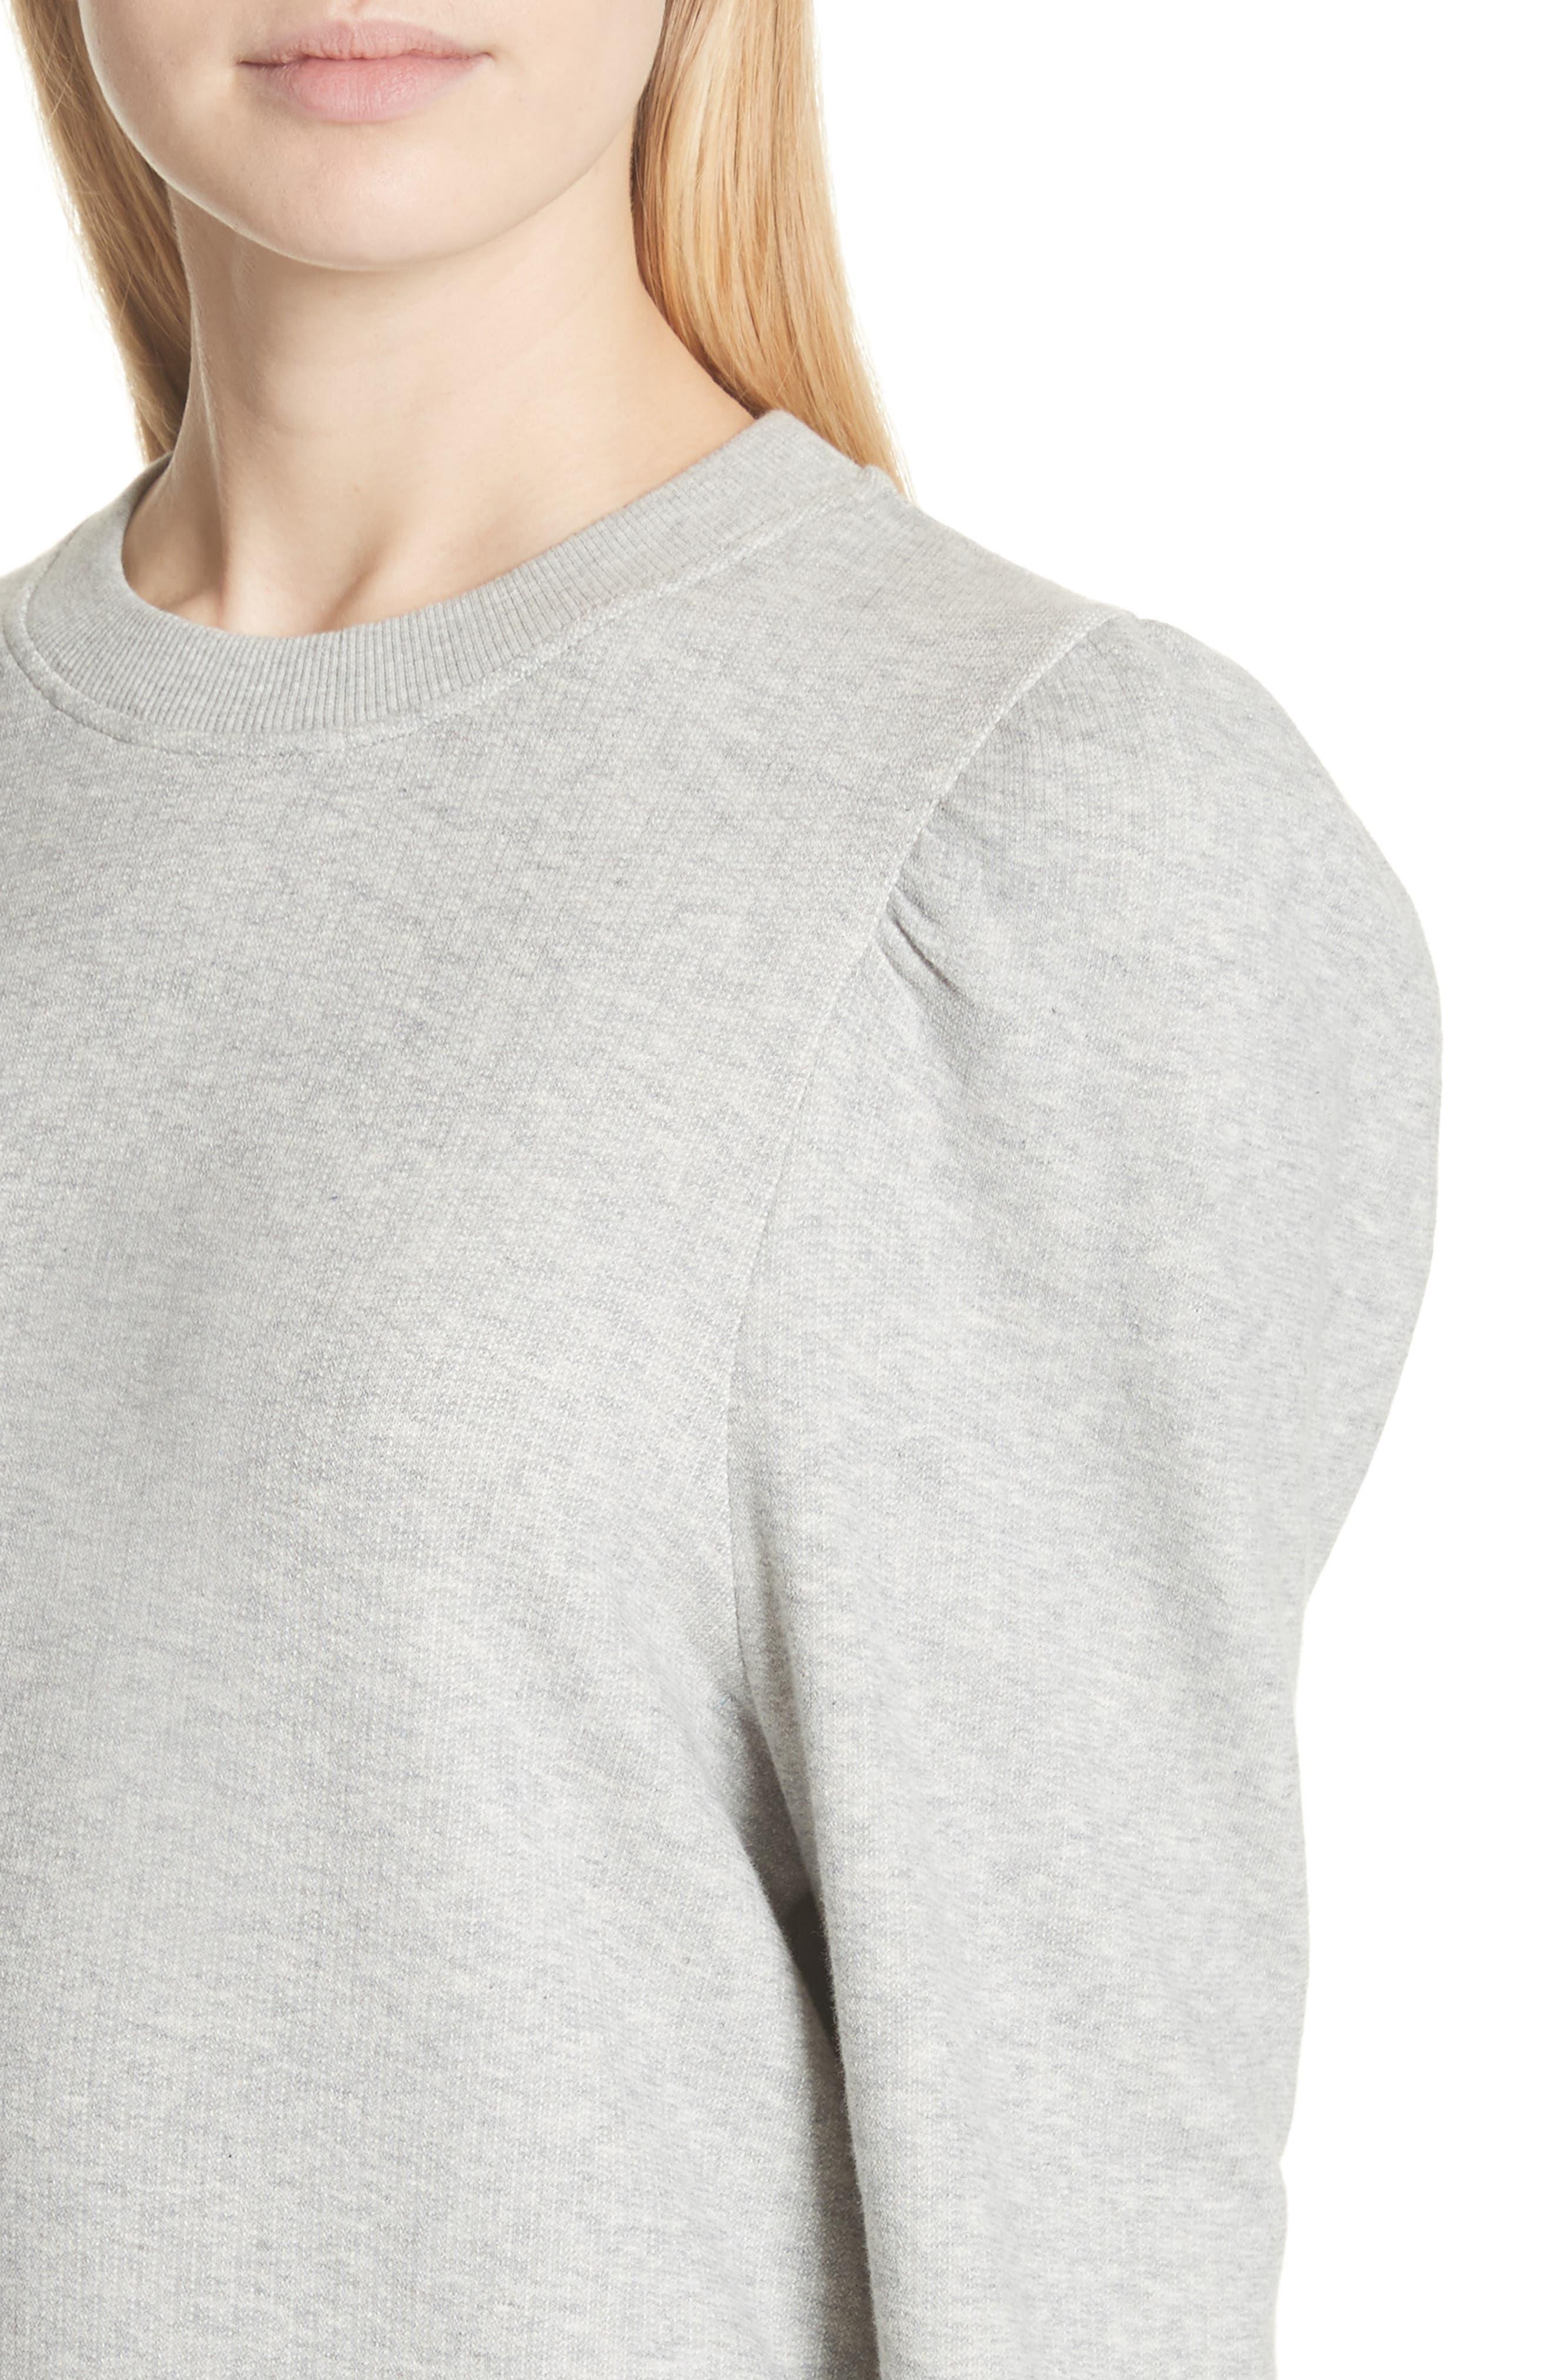 Puff Shoulder Sweater,                             Alternate thumbnail 4, color,                             030